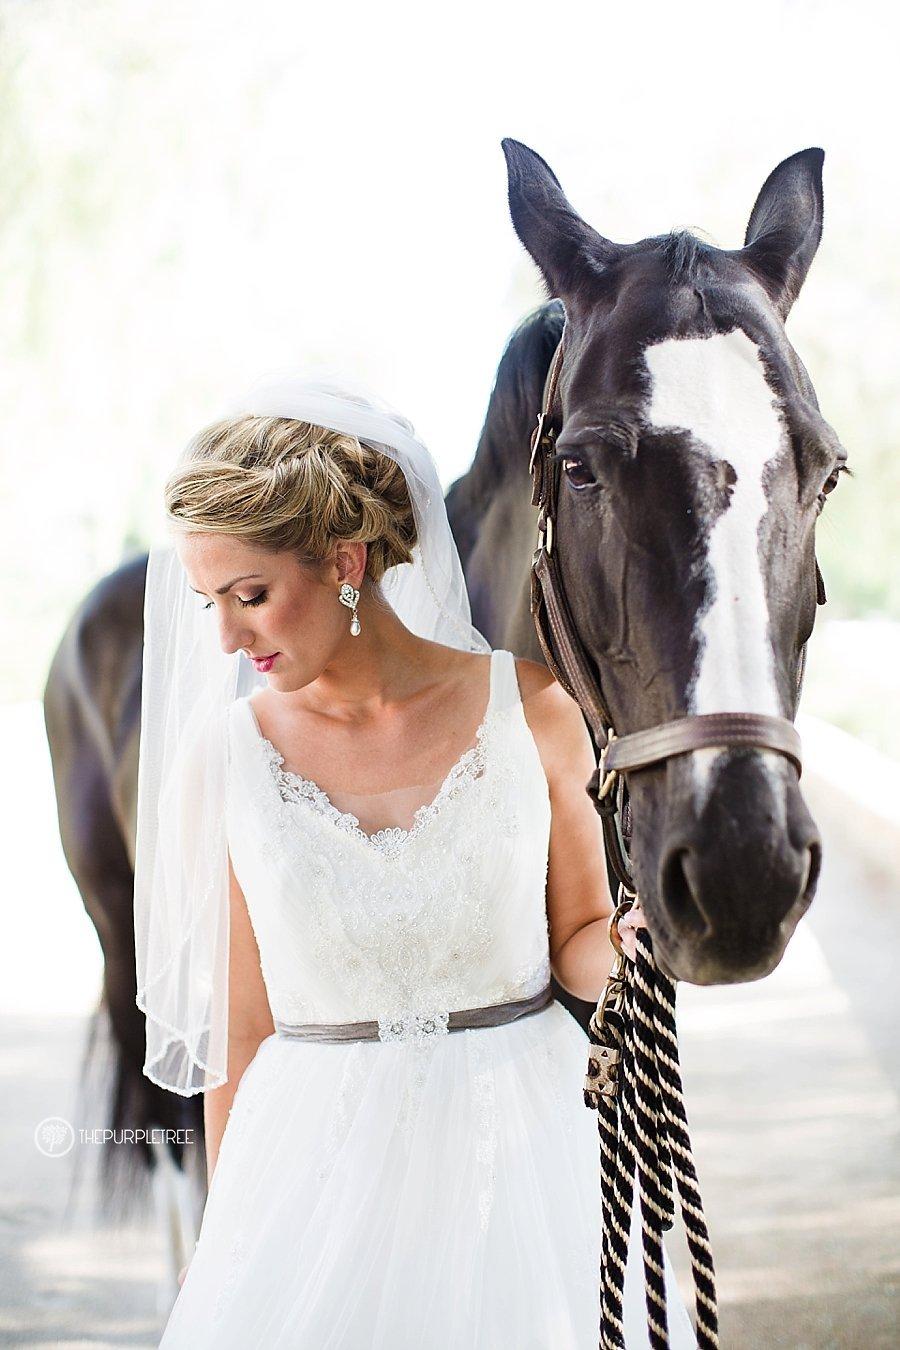 Frady_Wedding_cloriyohe_thepurpletree.com_4044.jpg